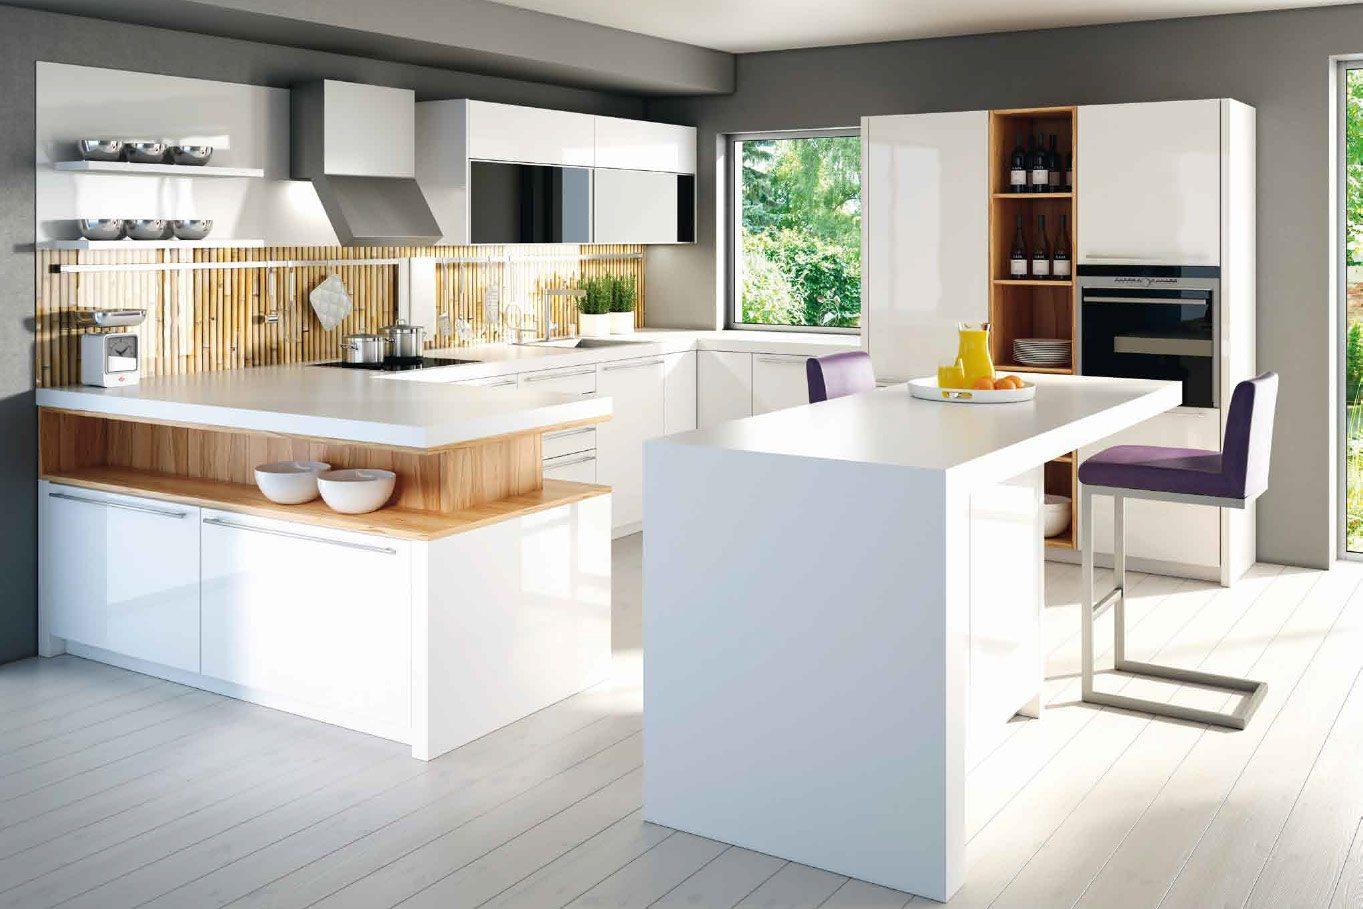 Witte keukens dan k chen keukens - Bar design keuken ...